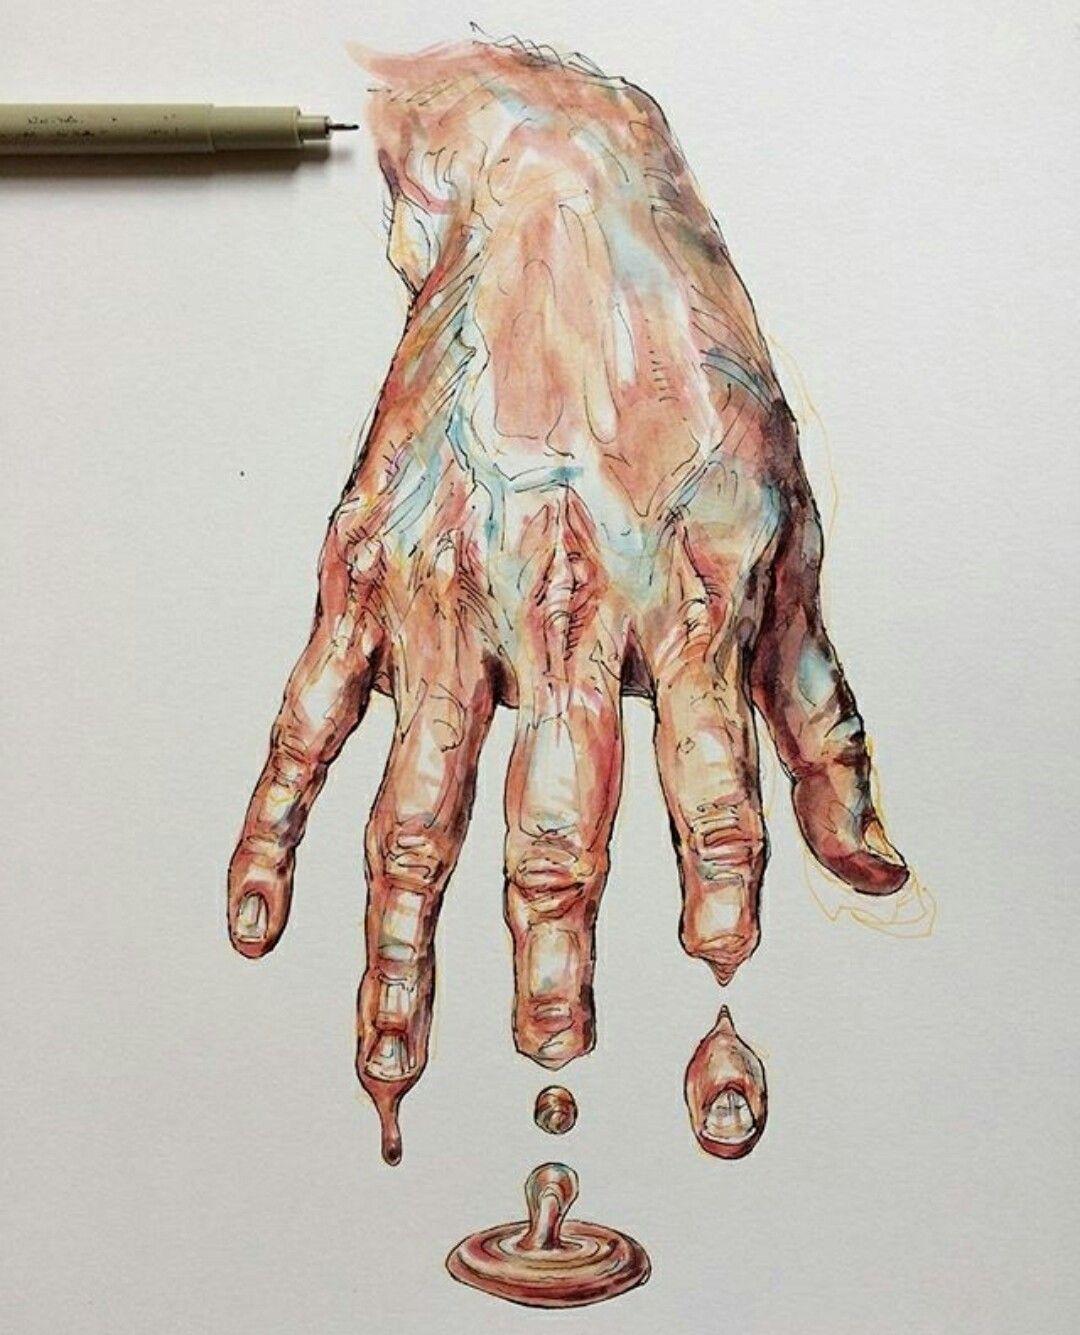 U4APSA Likes Surrealistic Strong Colors But Prevalent Linework Gcse ArtCreative SketchesCreative